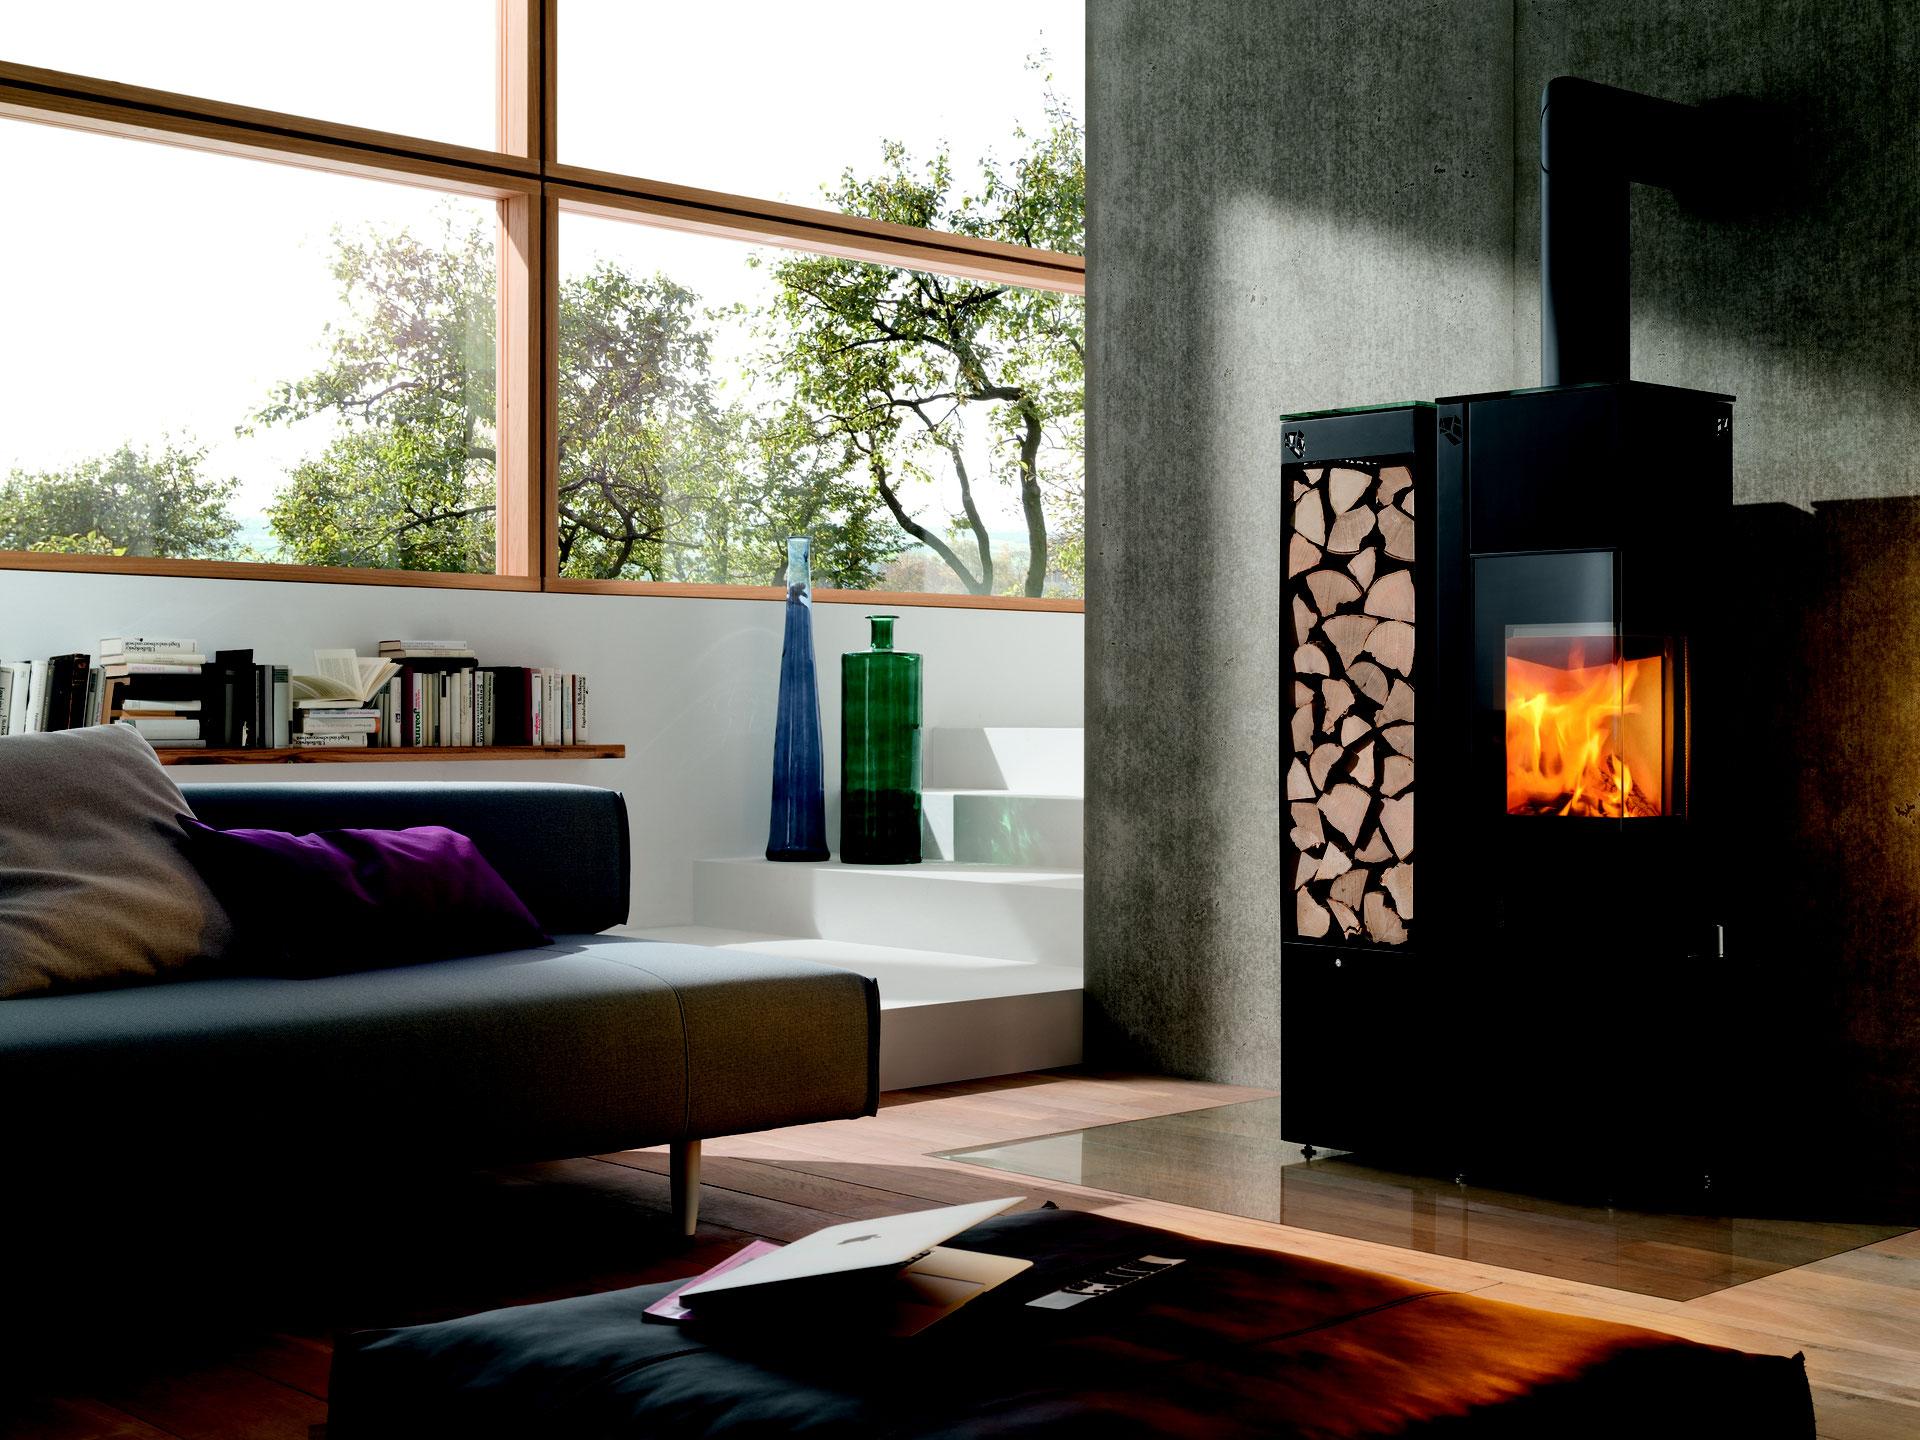 wodtke club11 hiwood ofenhaus mainspitze. Black Bedroom Furniture Sets. Home Design Ideas